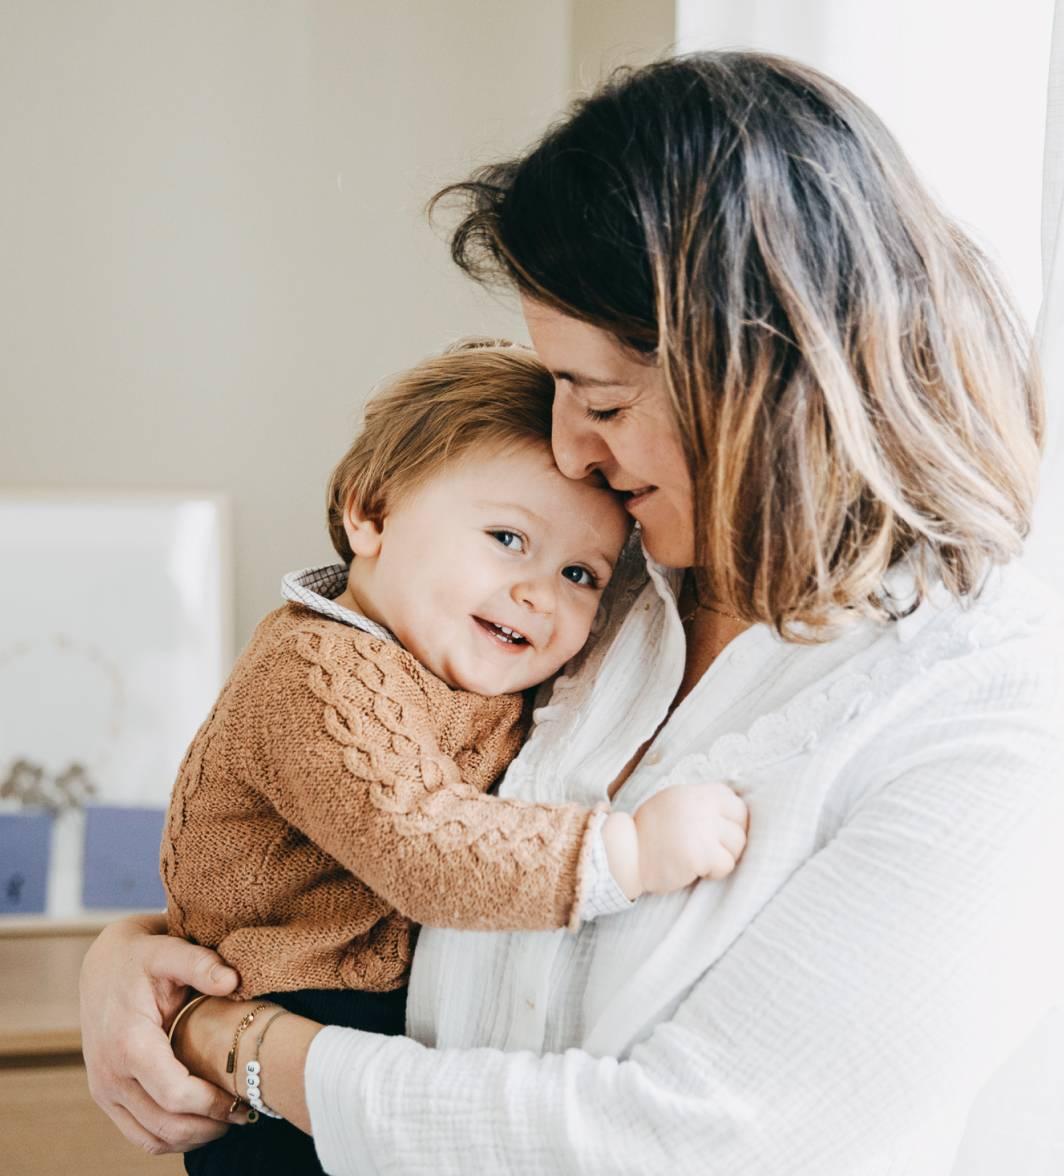 Propose baby-sitting - Paris (75 009) · Il y a 2 minutes